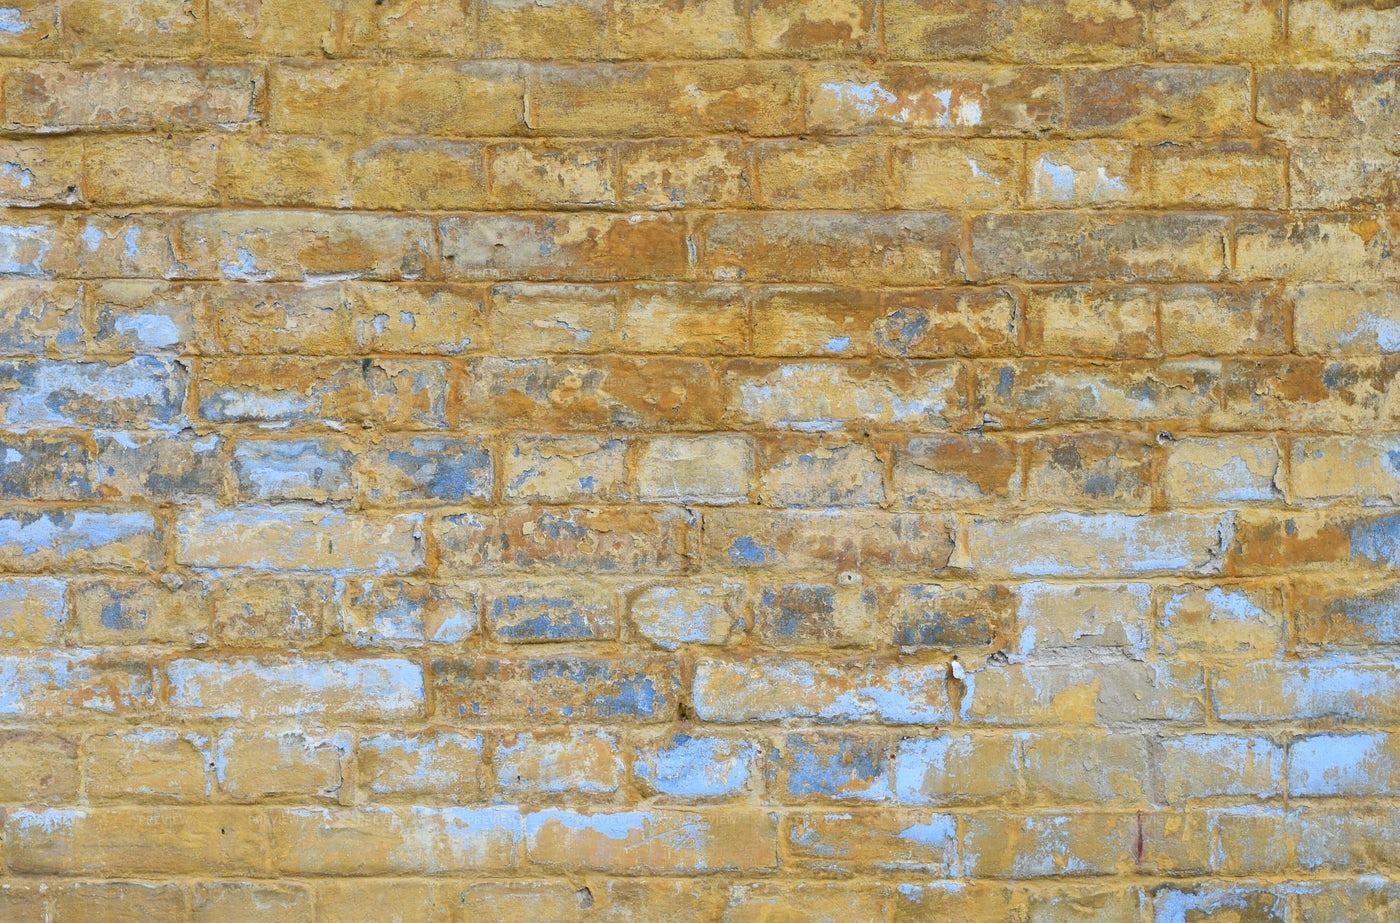 Weathering Brick Wall: Stock Photos